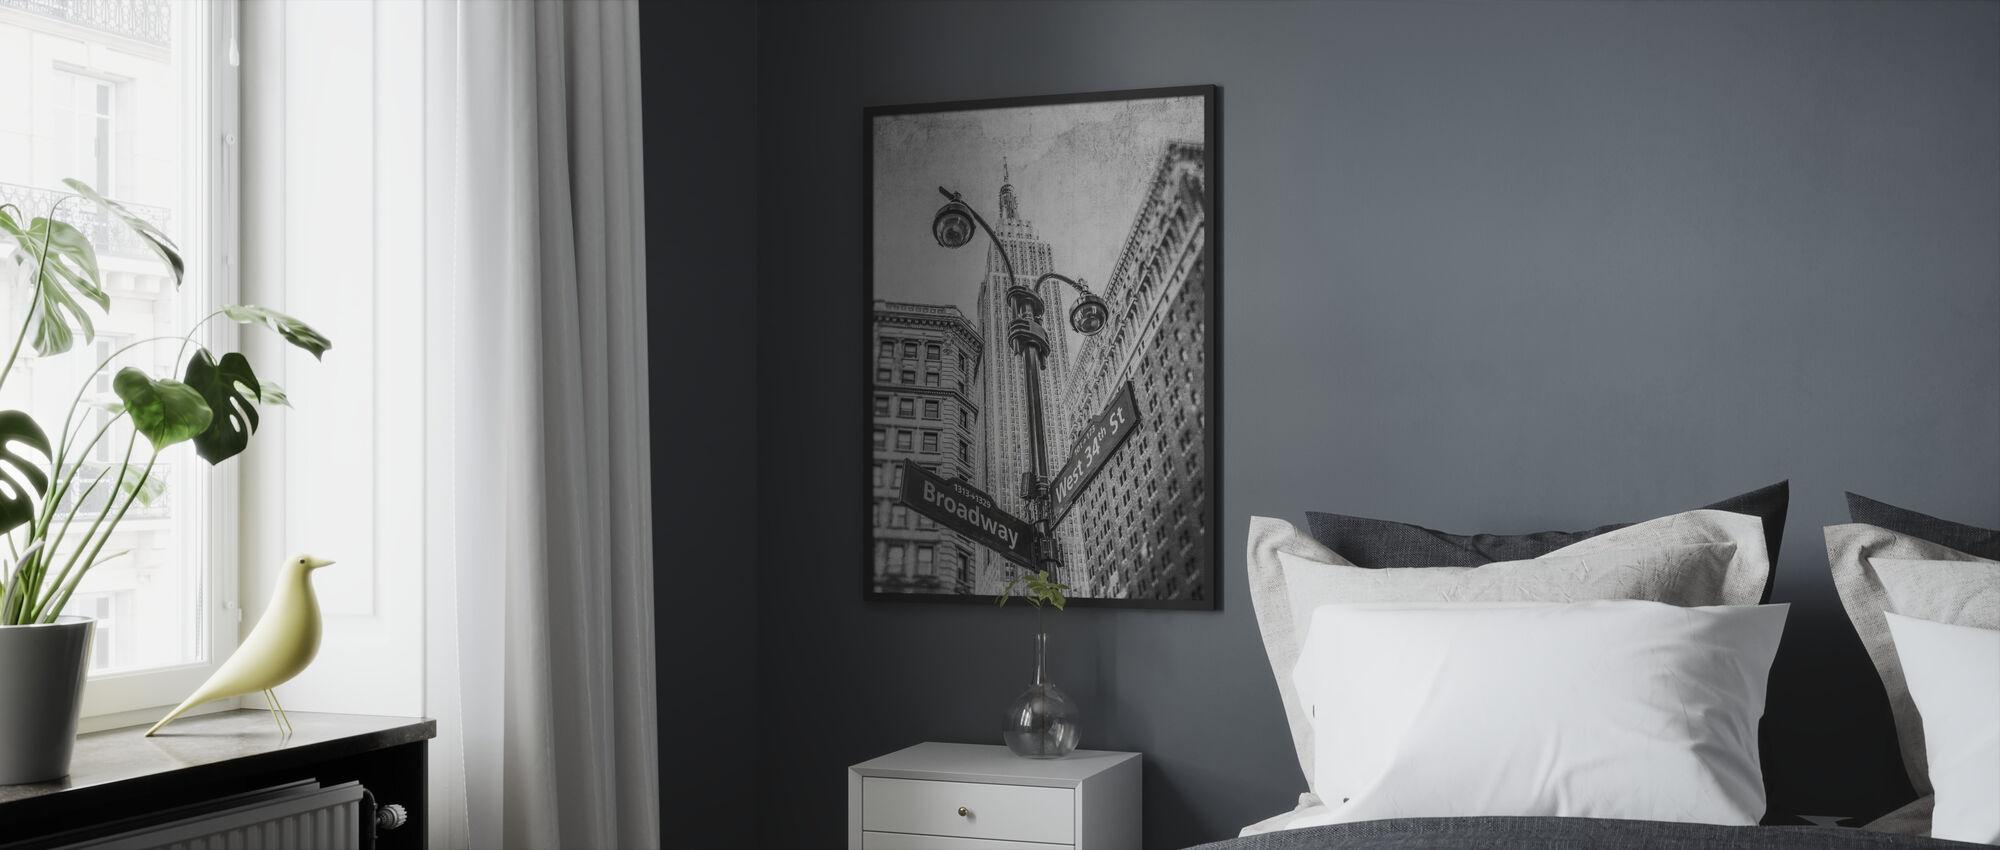 New York Signs - BW - Kehystetty kuva - Makuuhuone